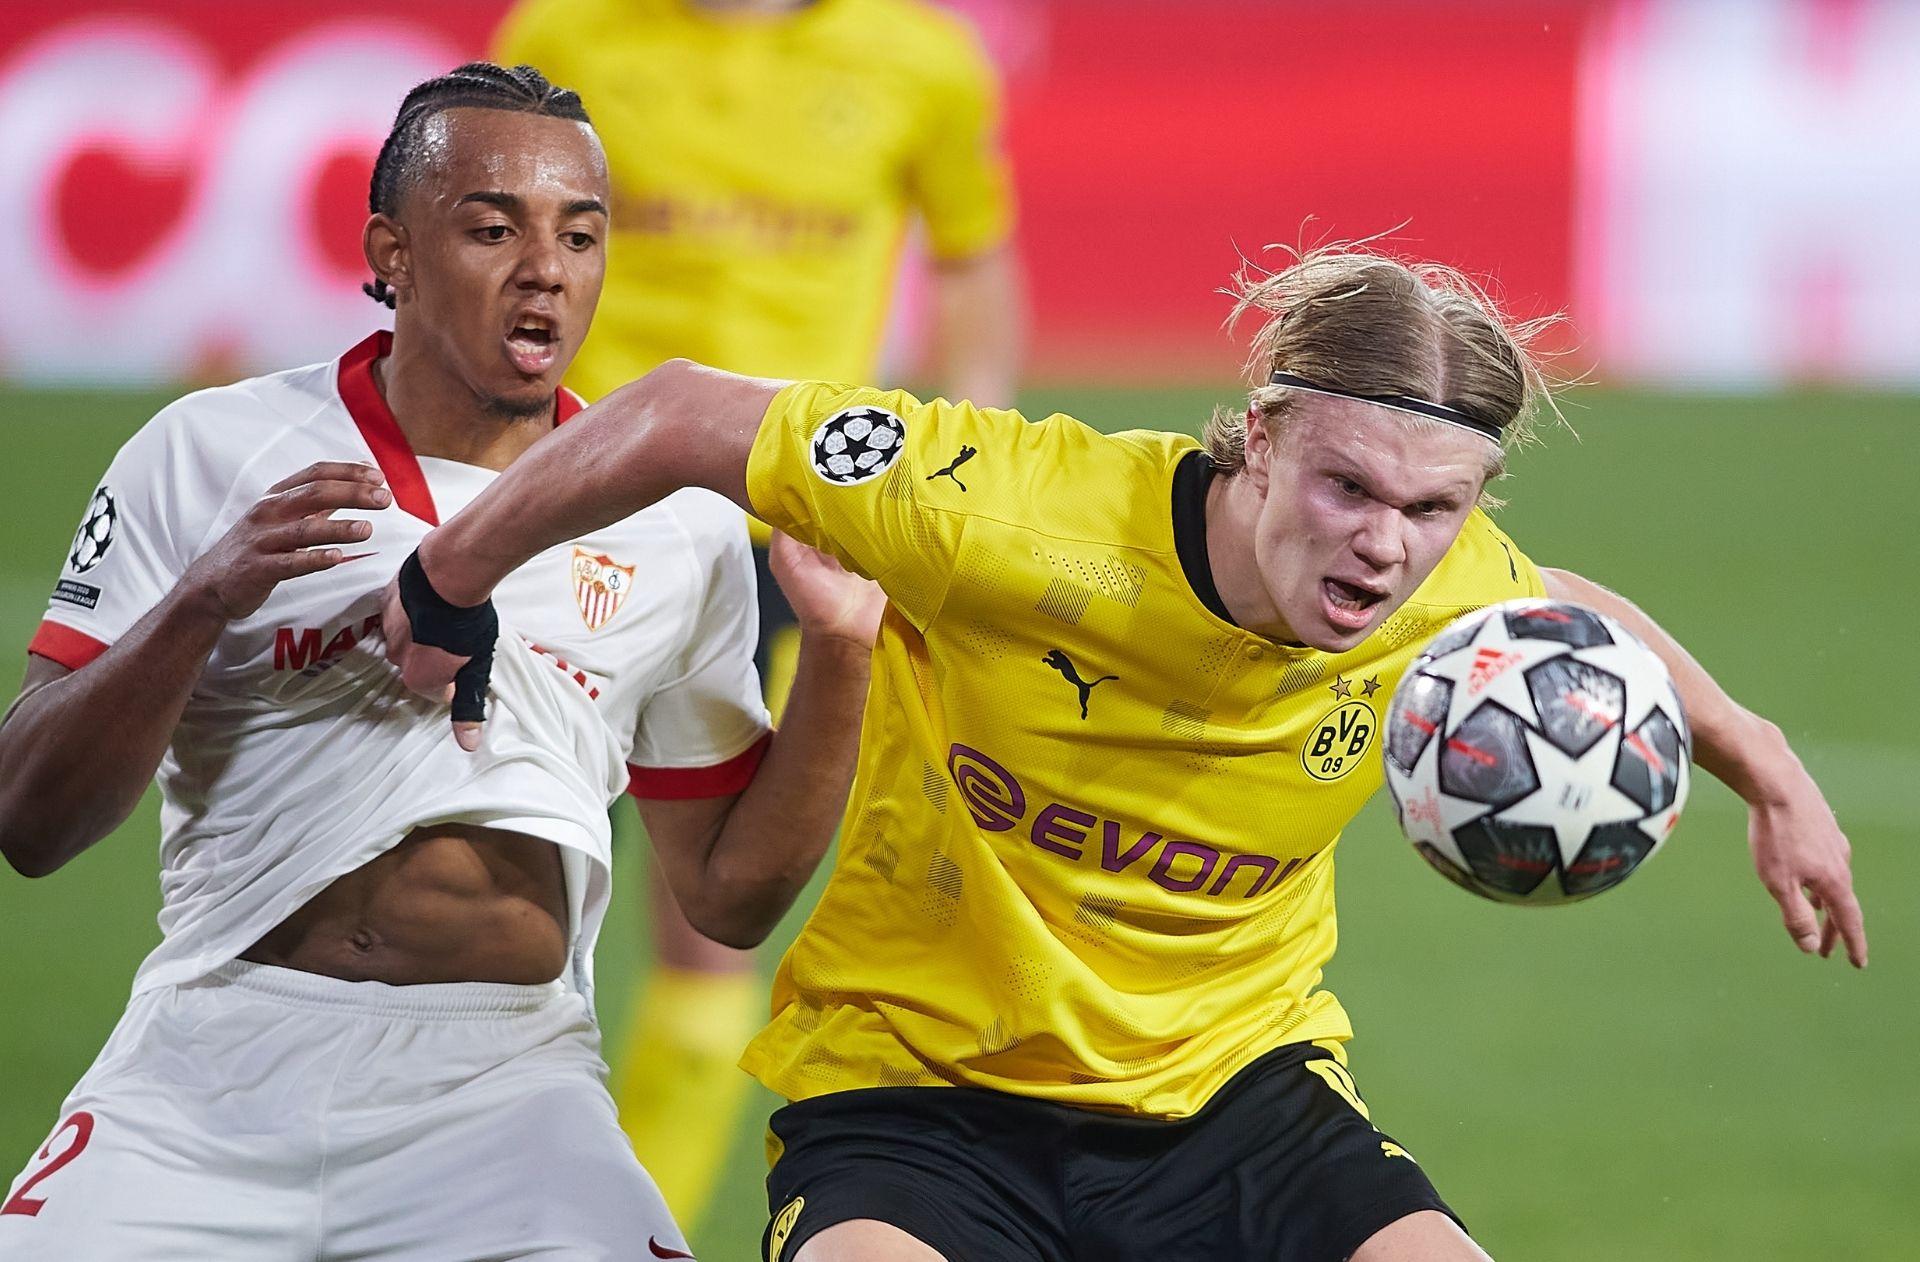 Borussia Dortmund vs Sevilla: Champions League